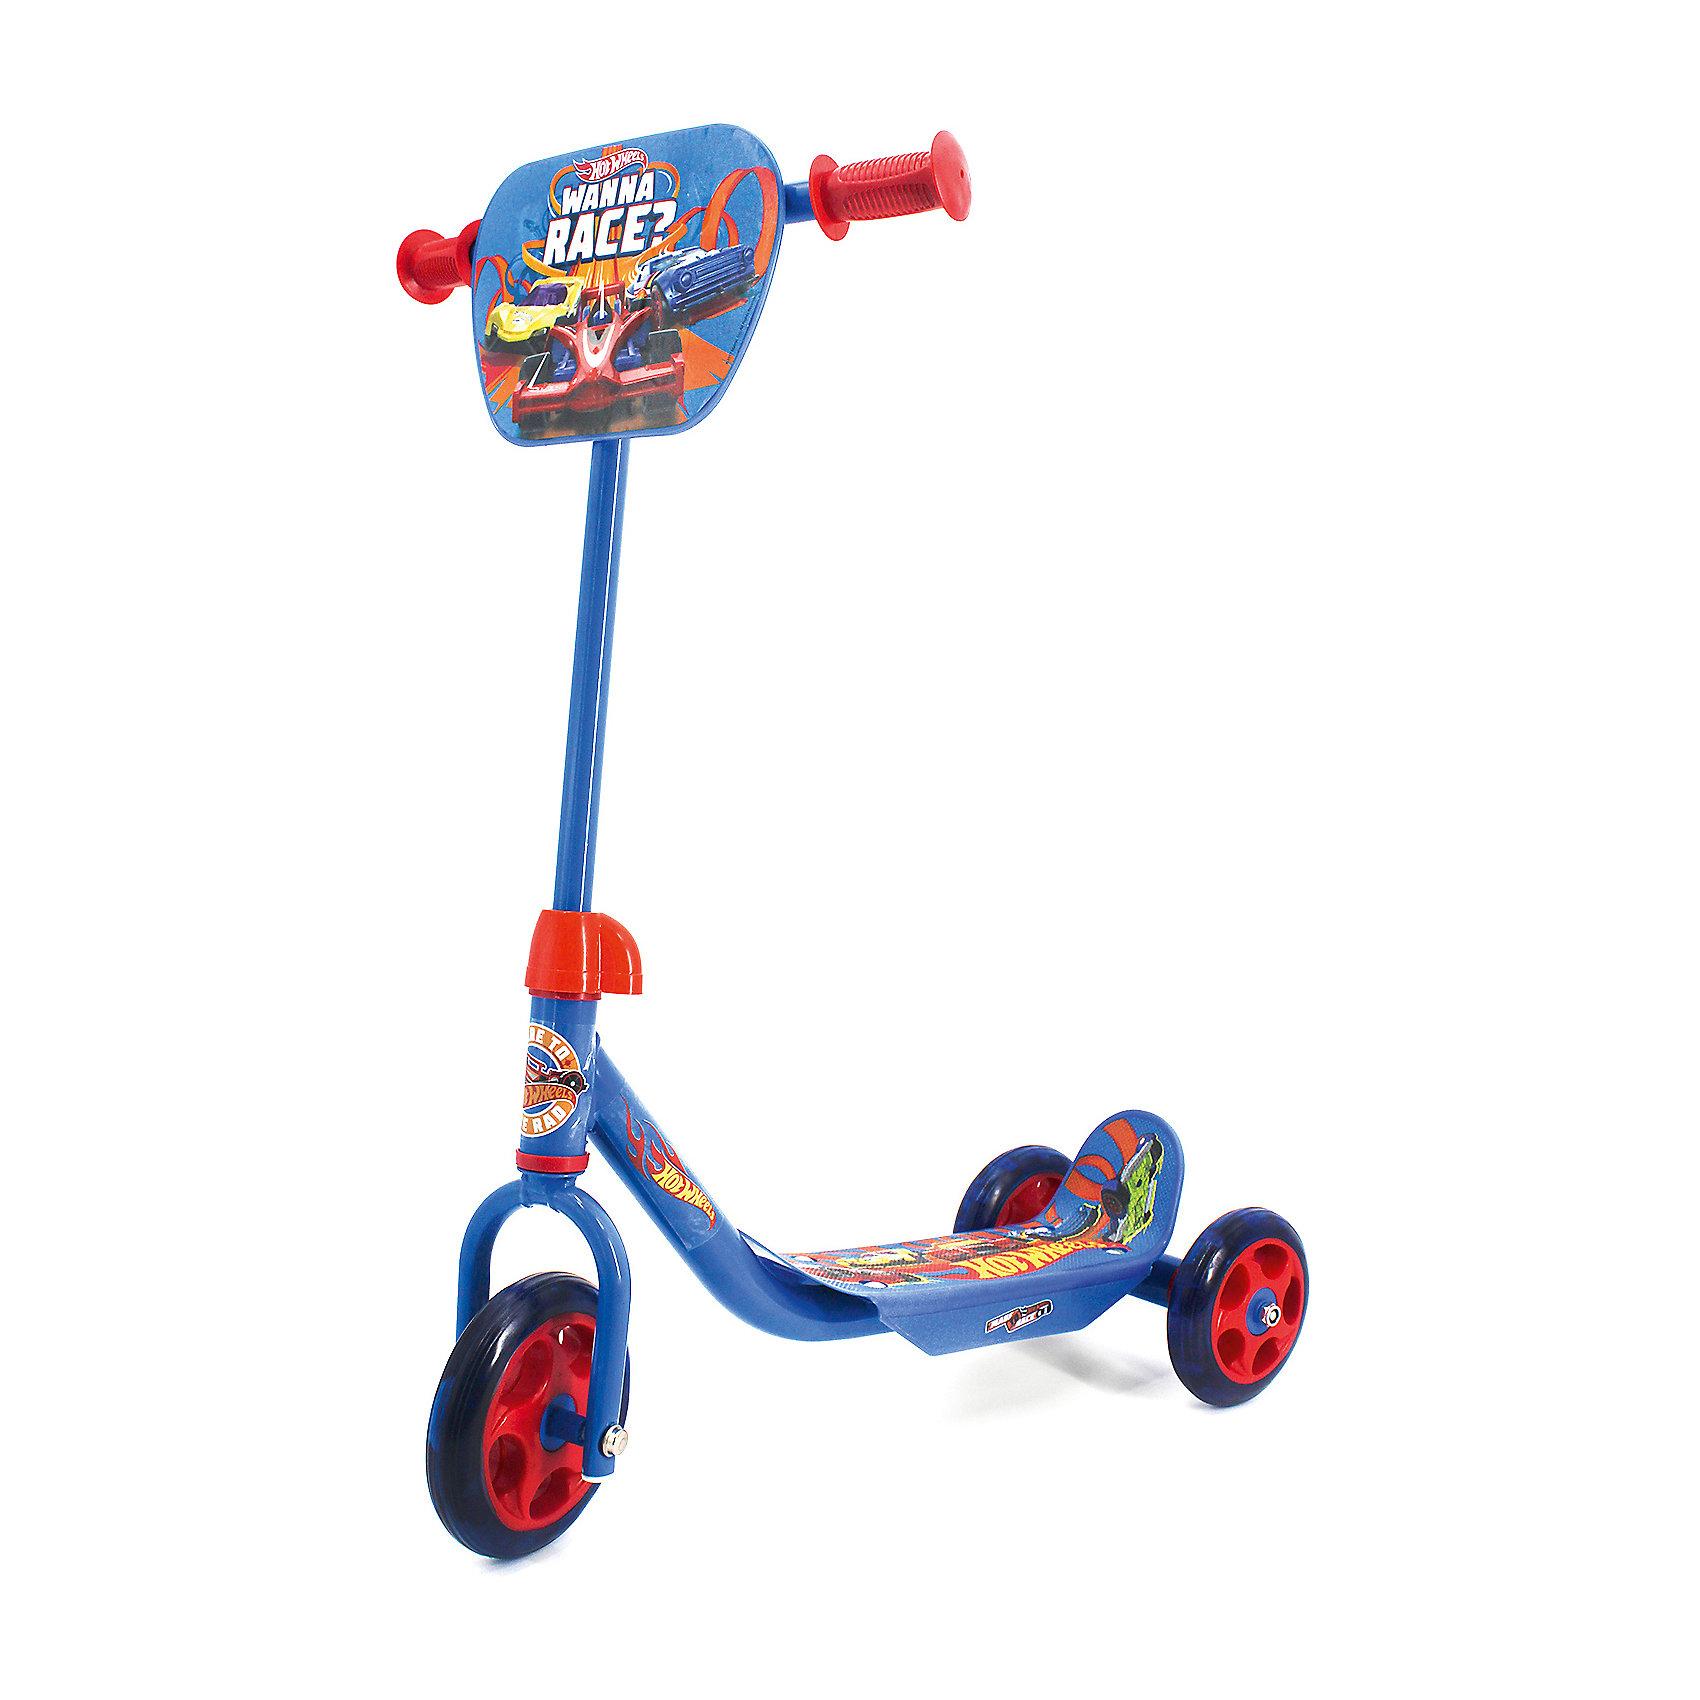 Фото 2 - Трехколесный самокат Next Hot wheels, синий синего цвета